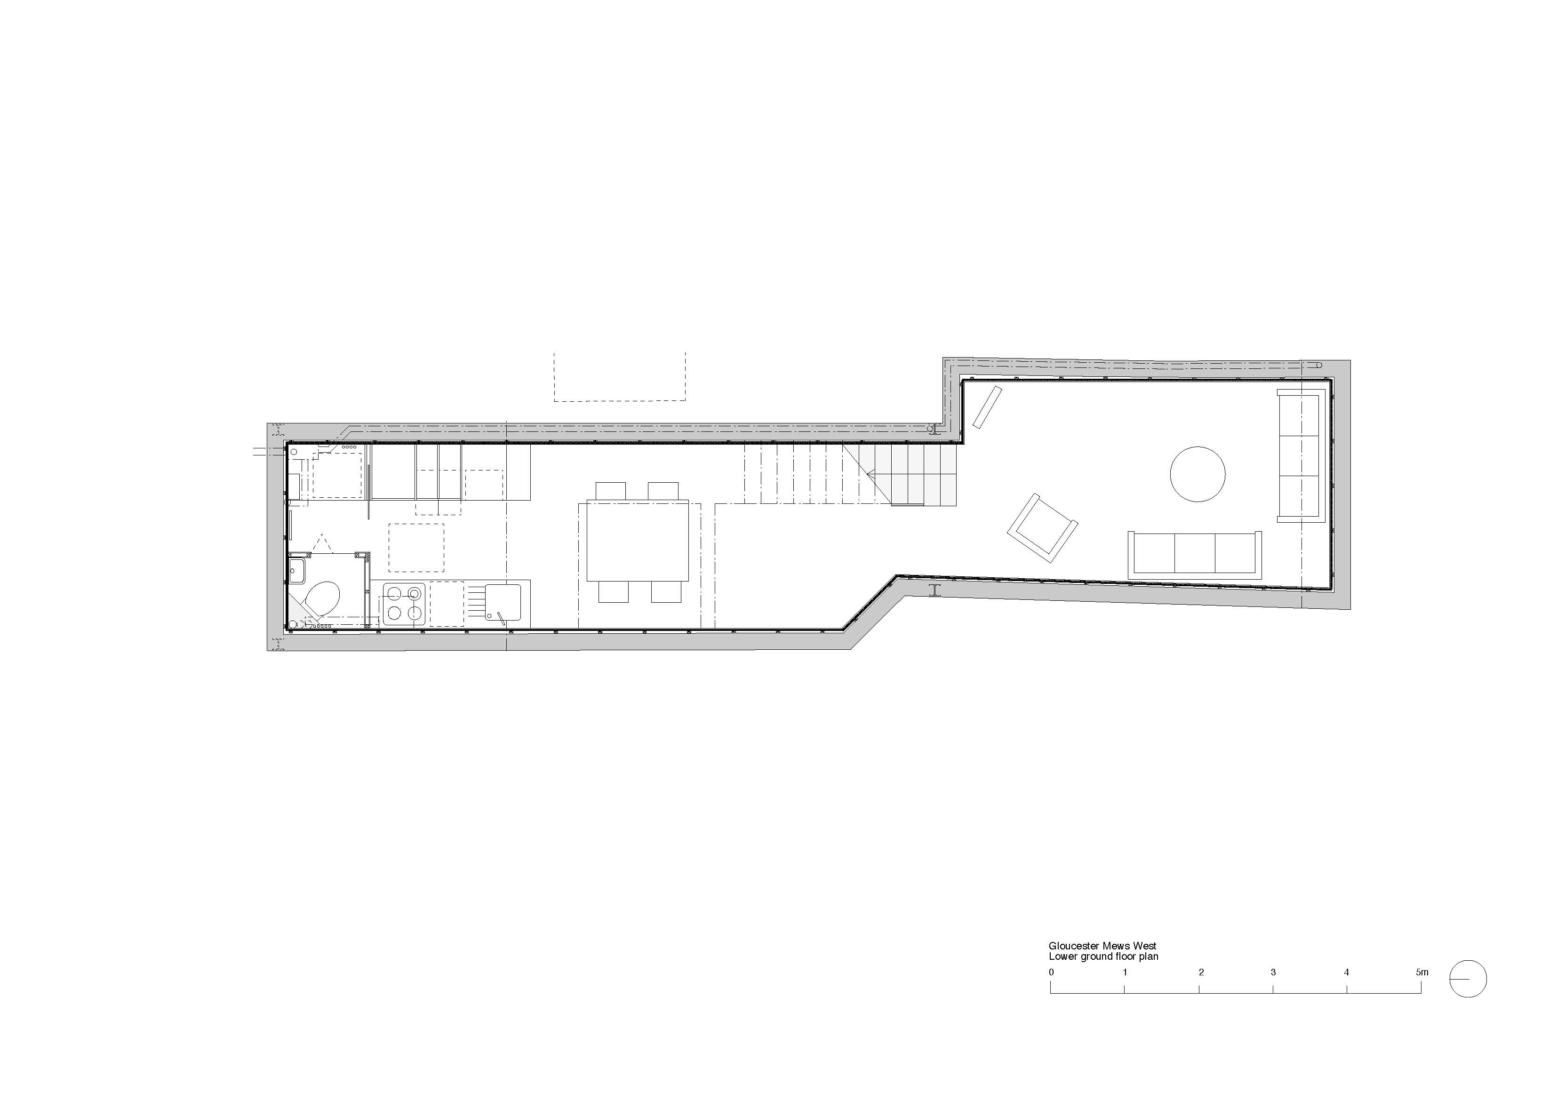 Gloucester Mews West lower ground floor plan